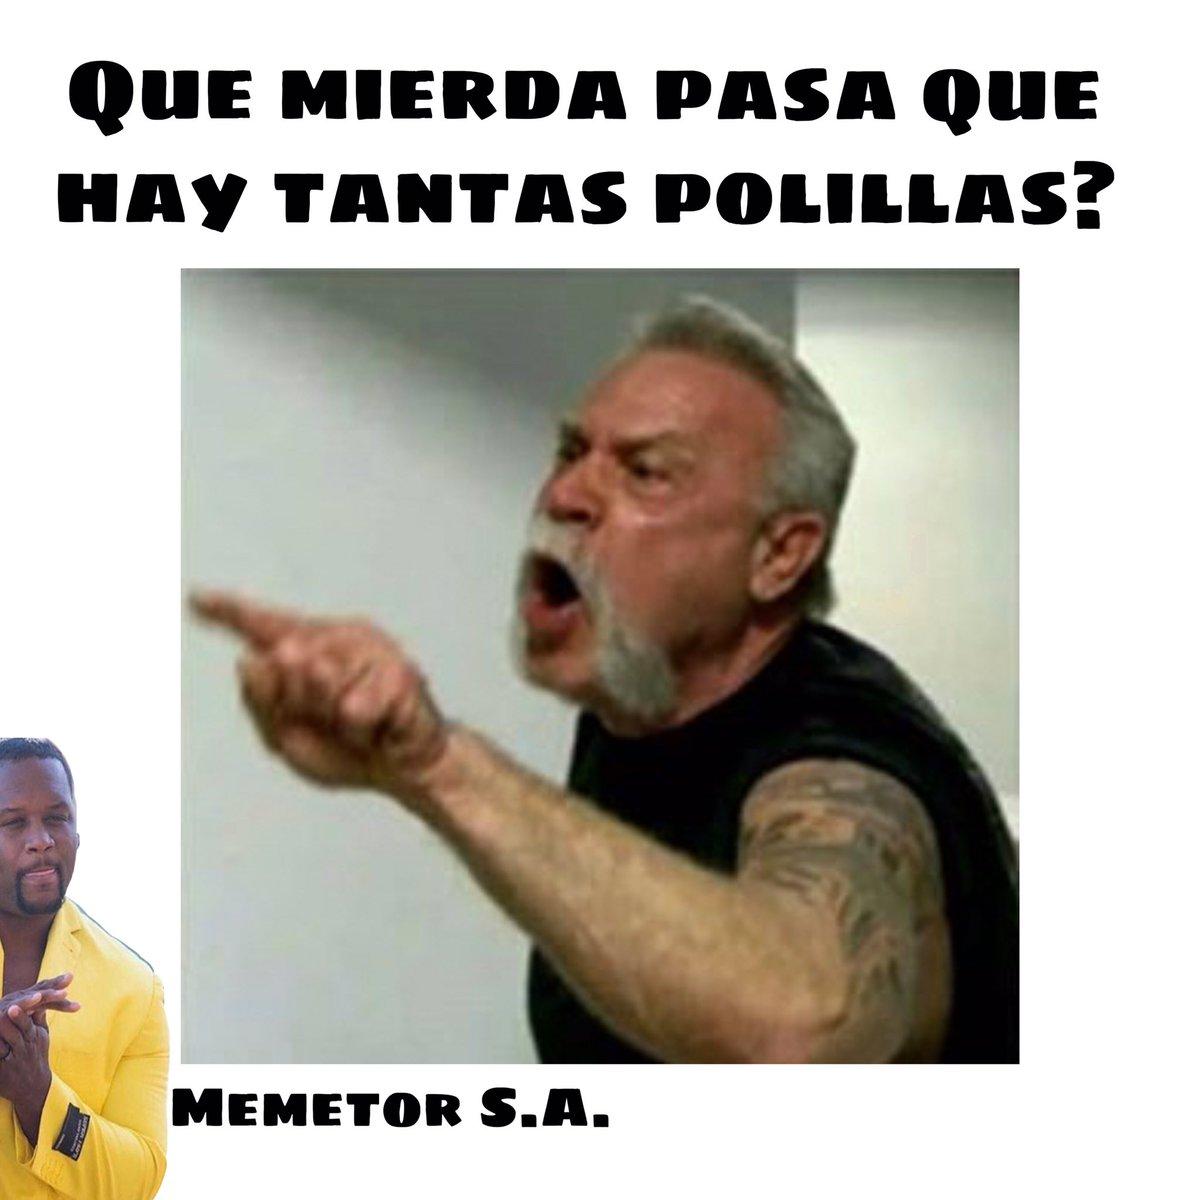 Porque? Quien sabe? #memesespañol #memes #memesvideos #chistes #videosgraciosos #satisfactorio #humorchileno #confesiones #satisfactorios #cmamo #chistoso #humoreate #humorlatino #satisfy #satisfying #satisfyingvideos #trickshot #trickshot #memesespañol #memesvideos #chiste #humopic.twitter.com/vsMlkzQbPh